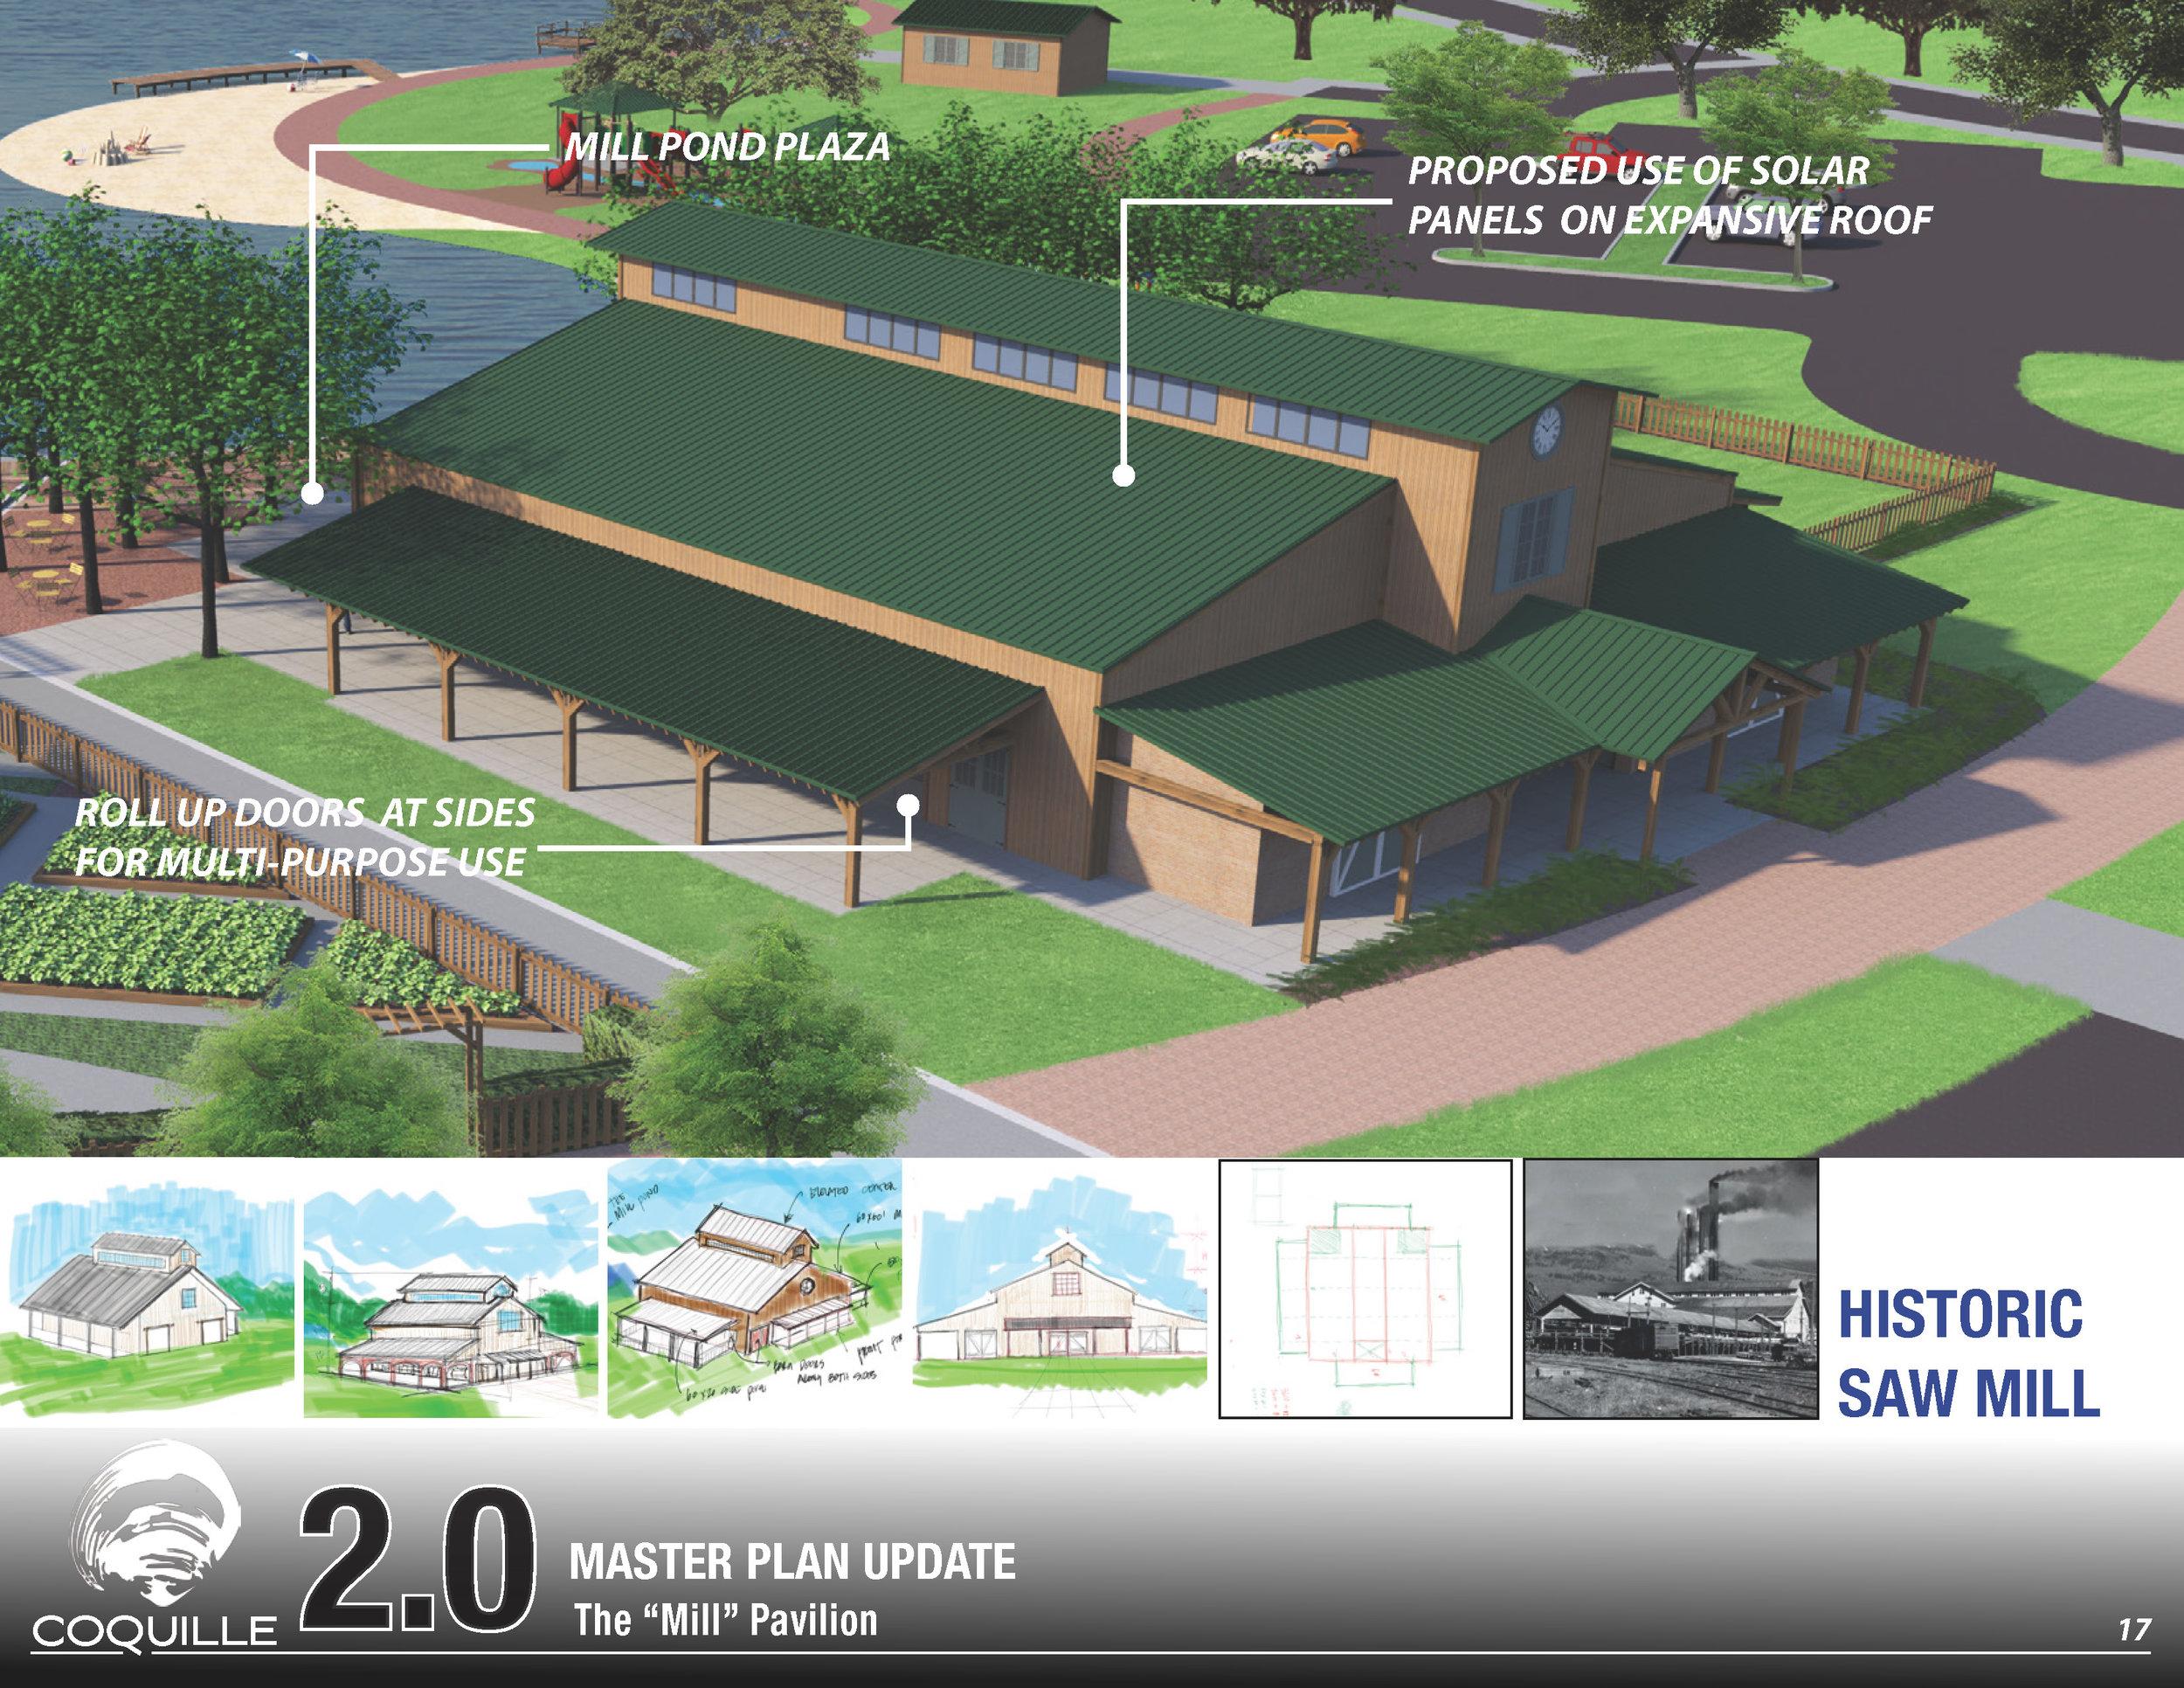 Joseph Furr Design Studio - Coquille Master Plan_Page_15.jpg